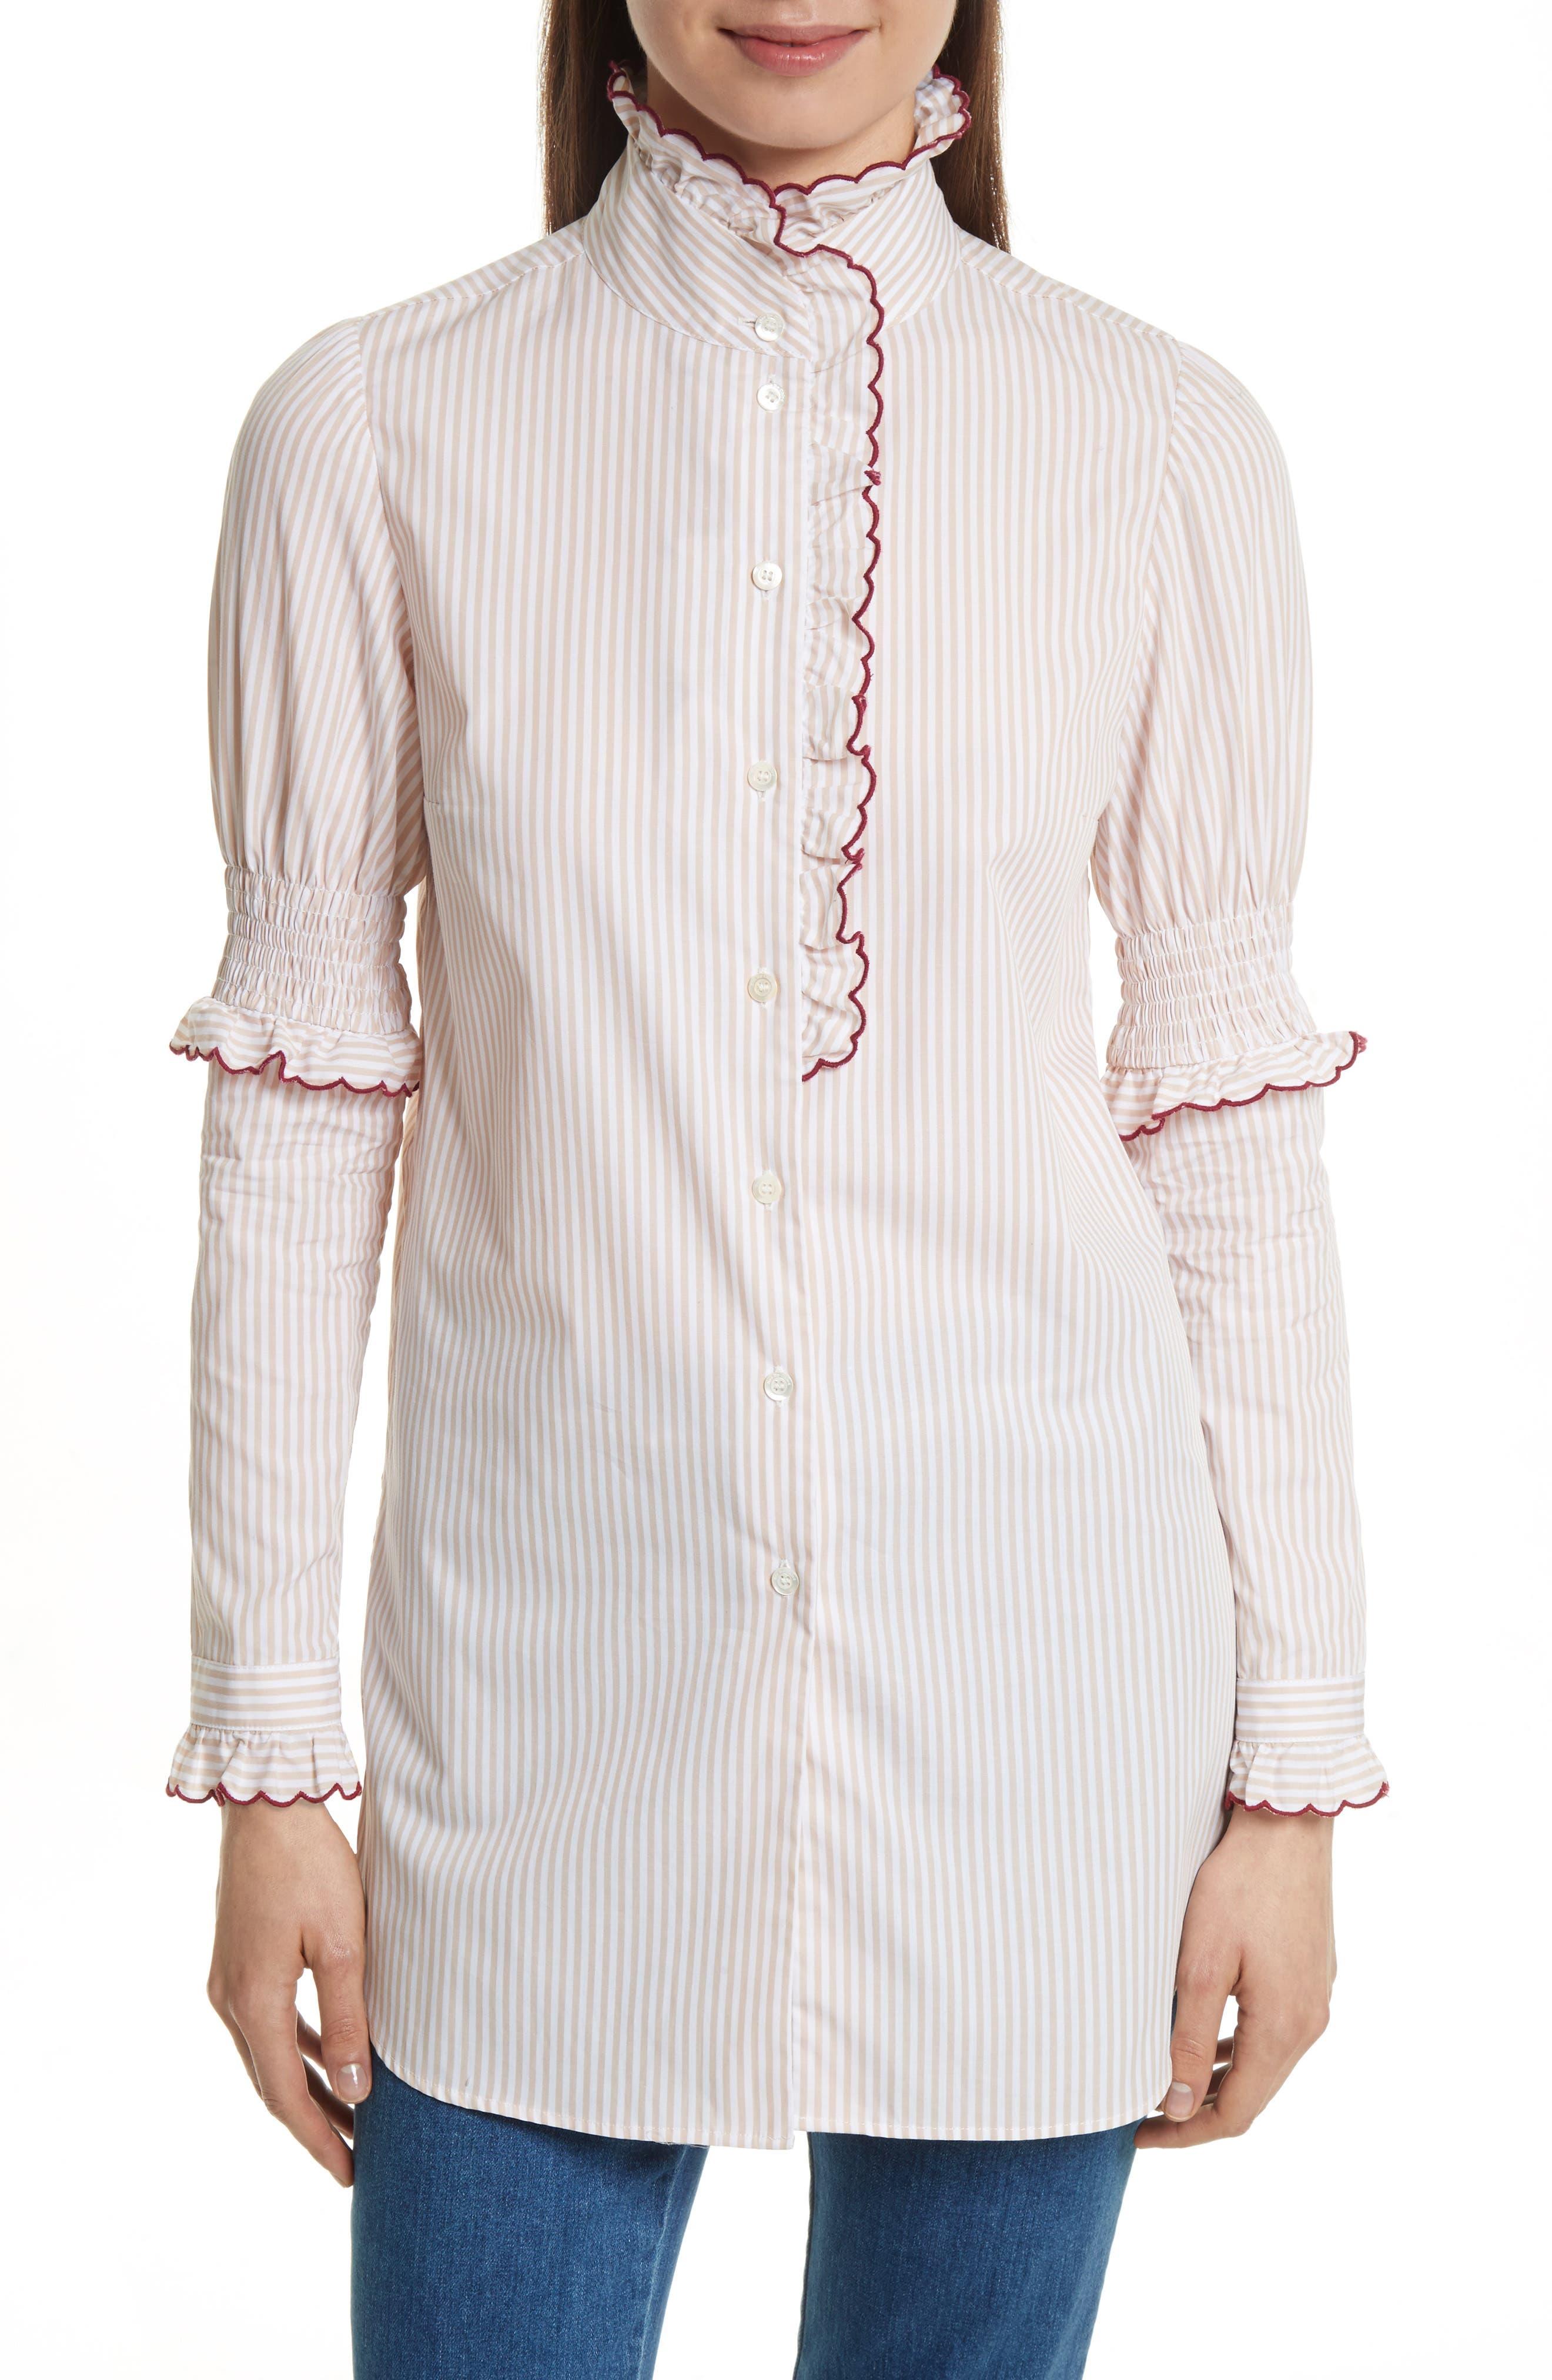 Stripe Cotton Shirt,                             Main thumbnail 1, color,                             Beige-White